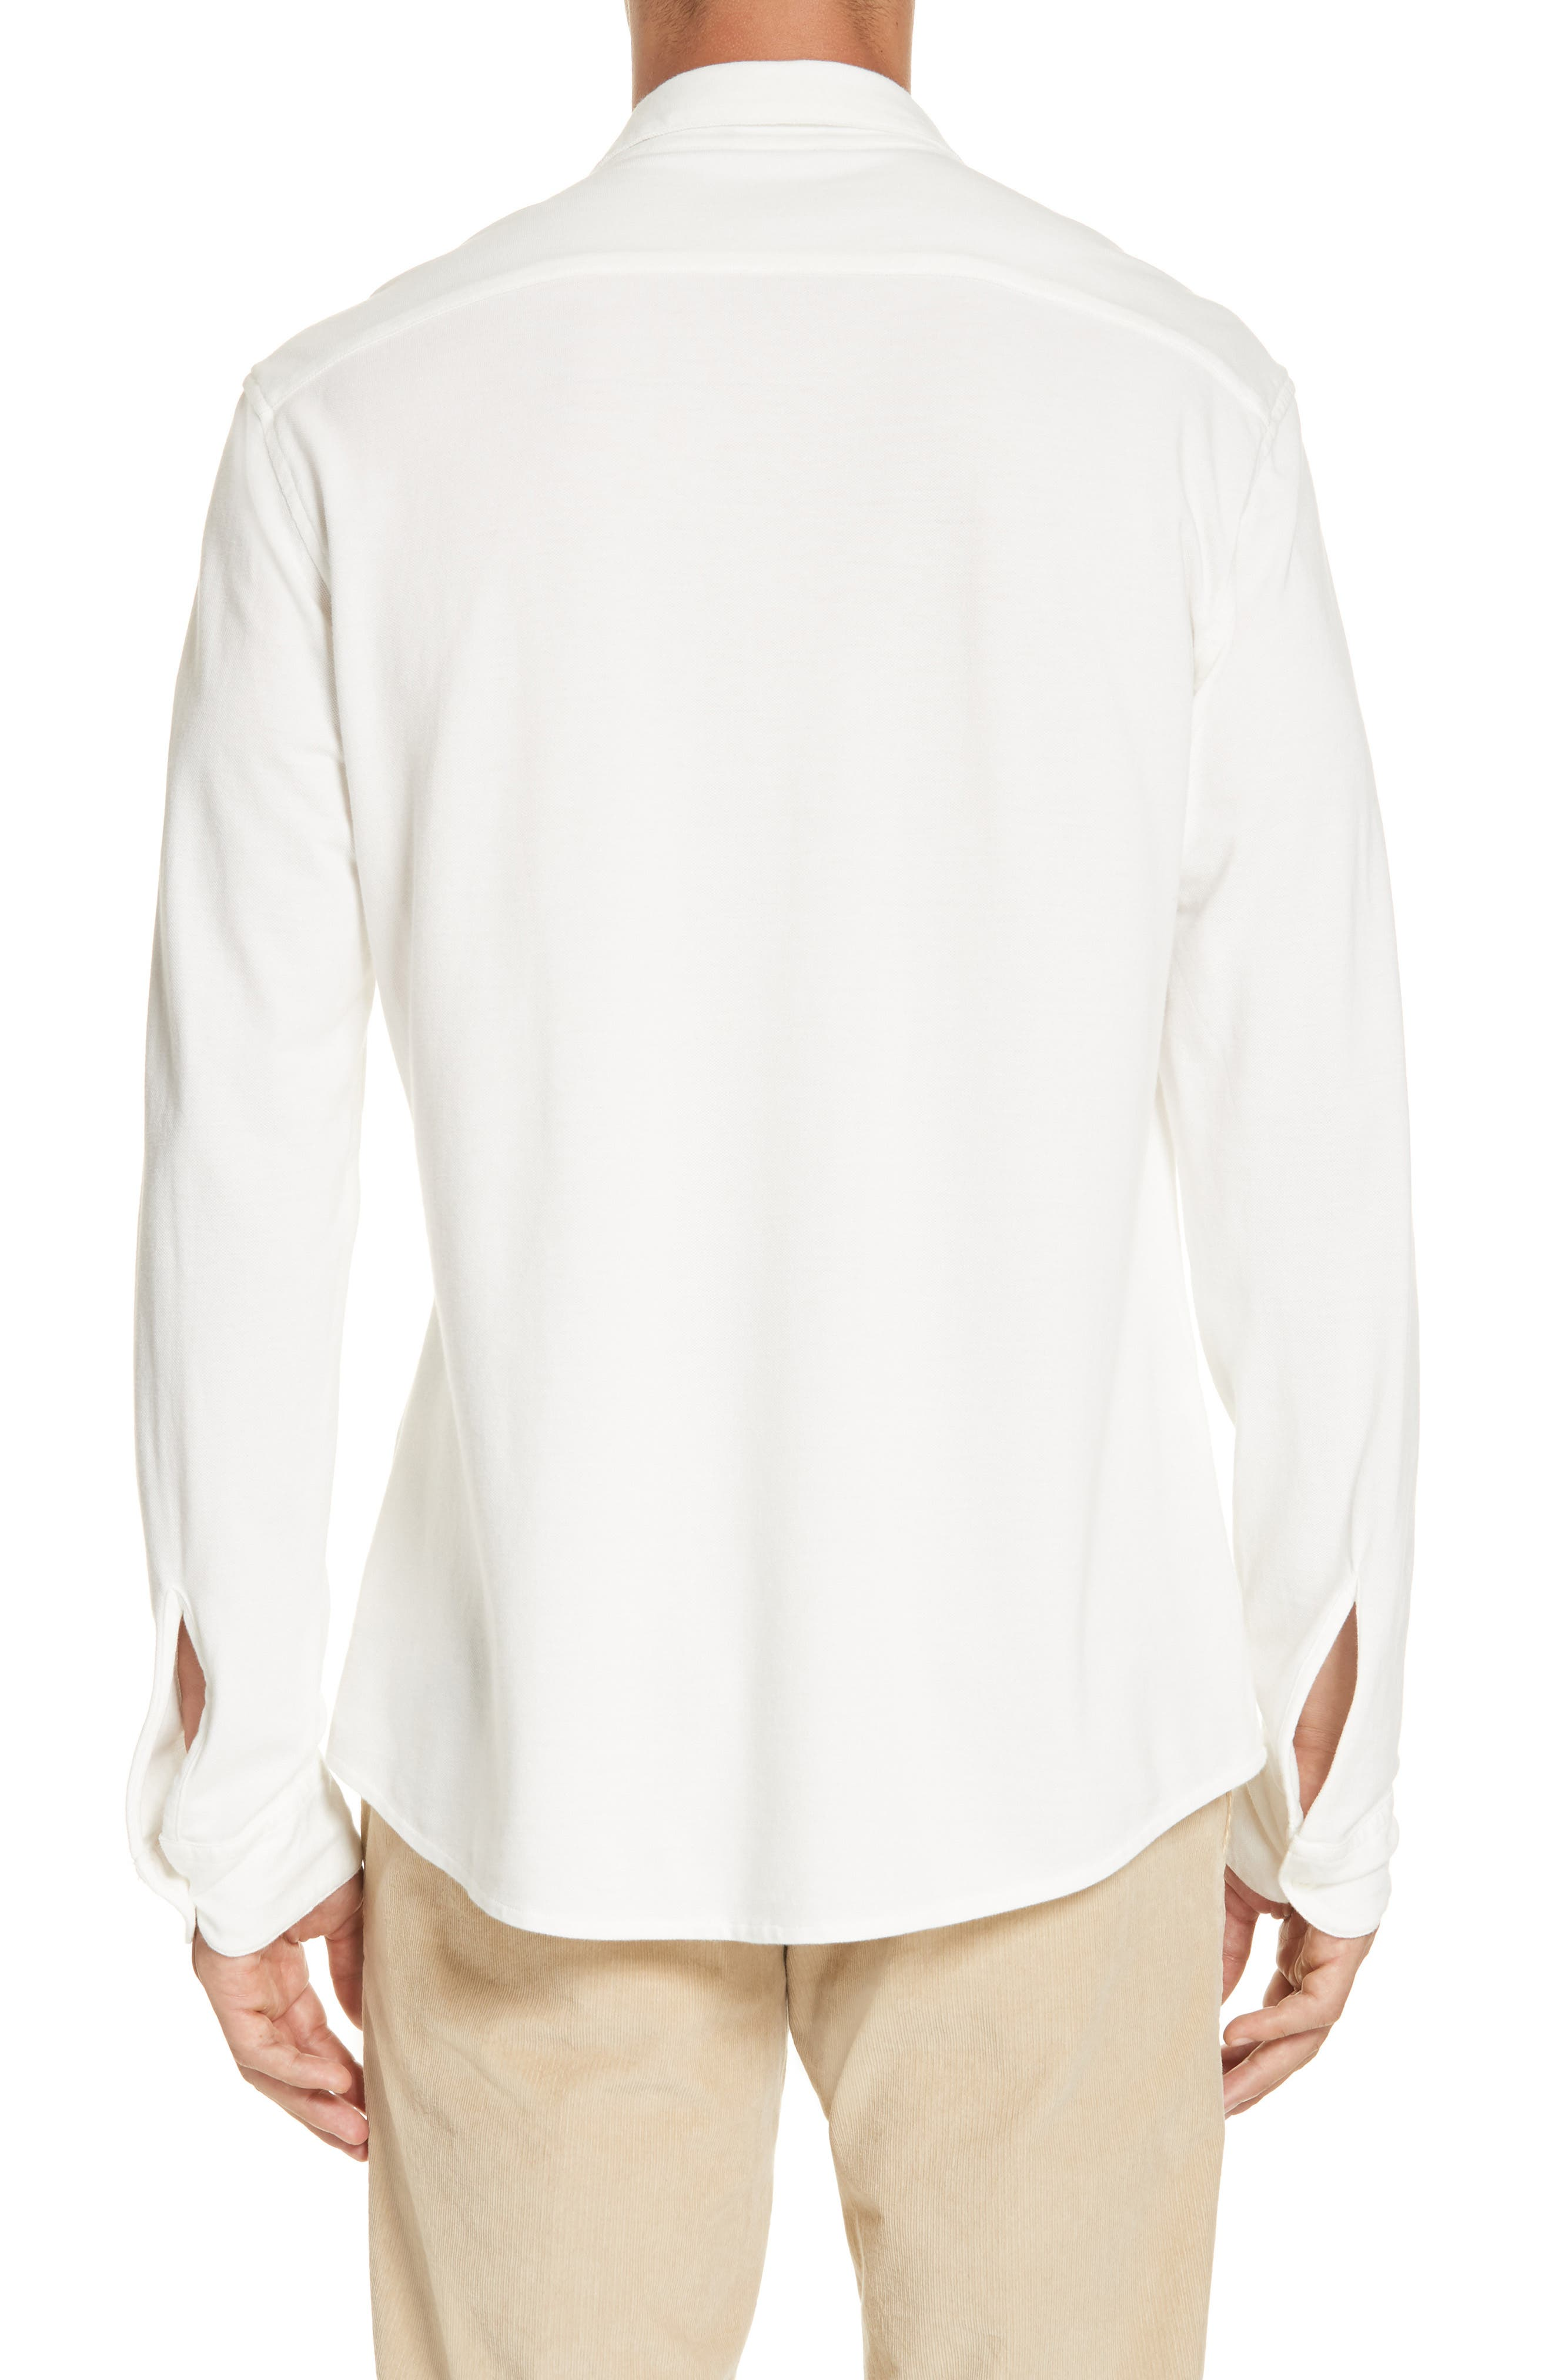 Coppi Tamiso Sport Shirt,                             Alternate thumbnail 2, color,                             WHITE